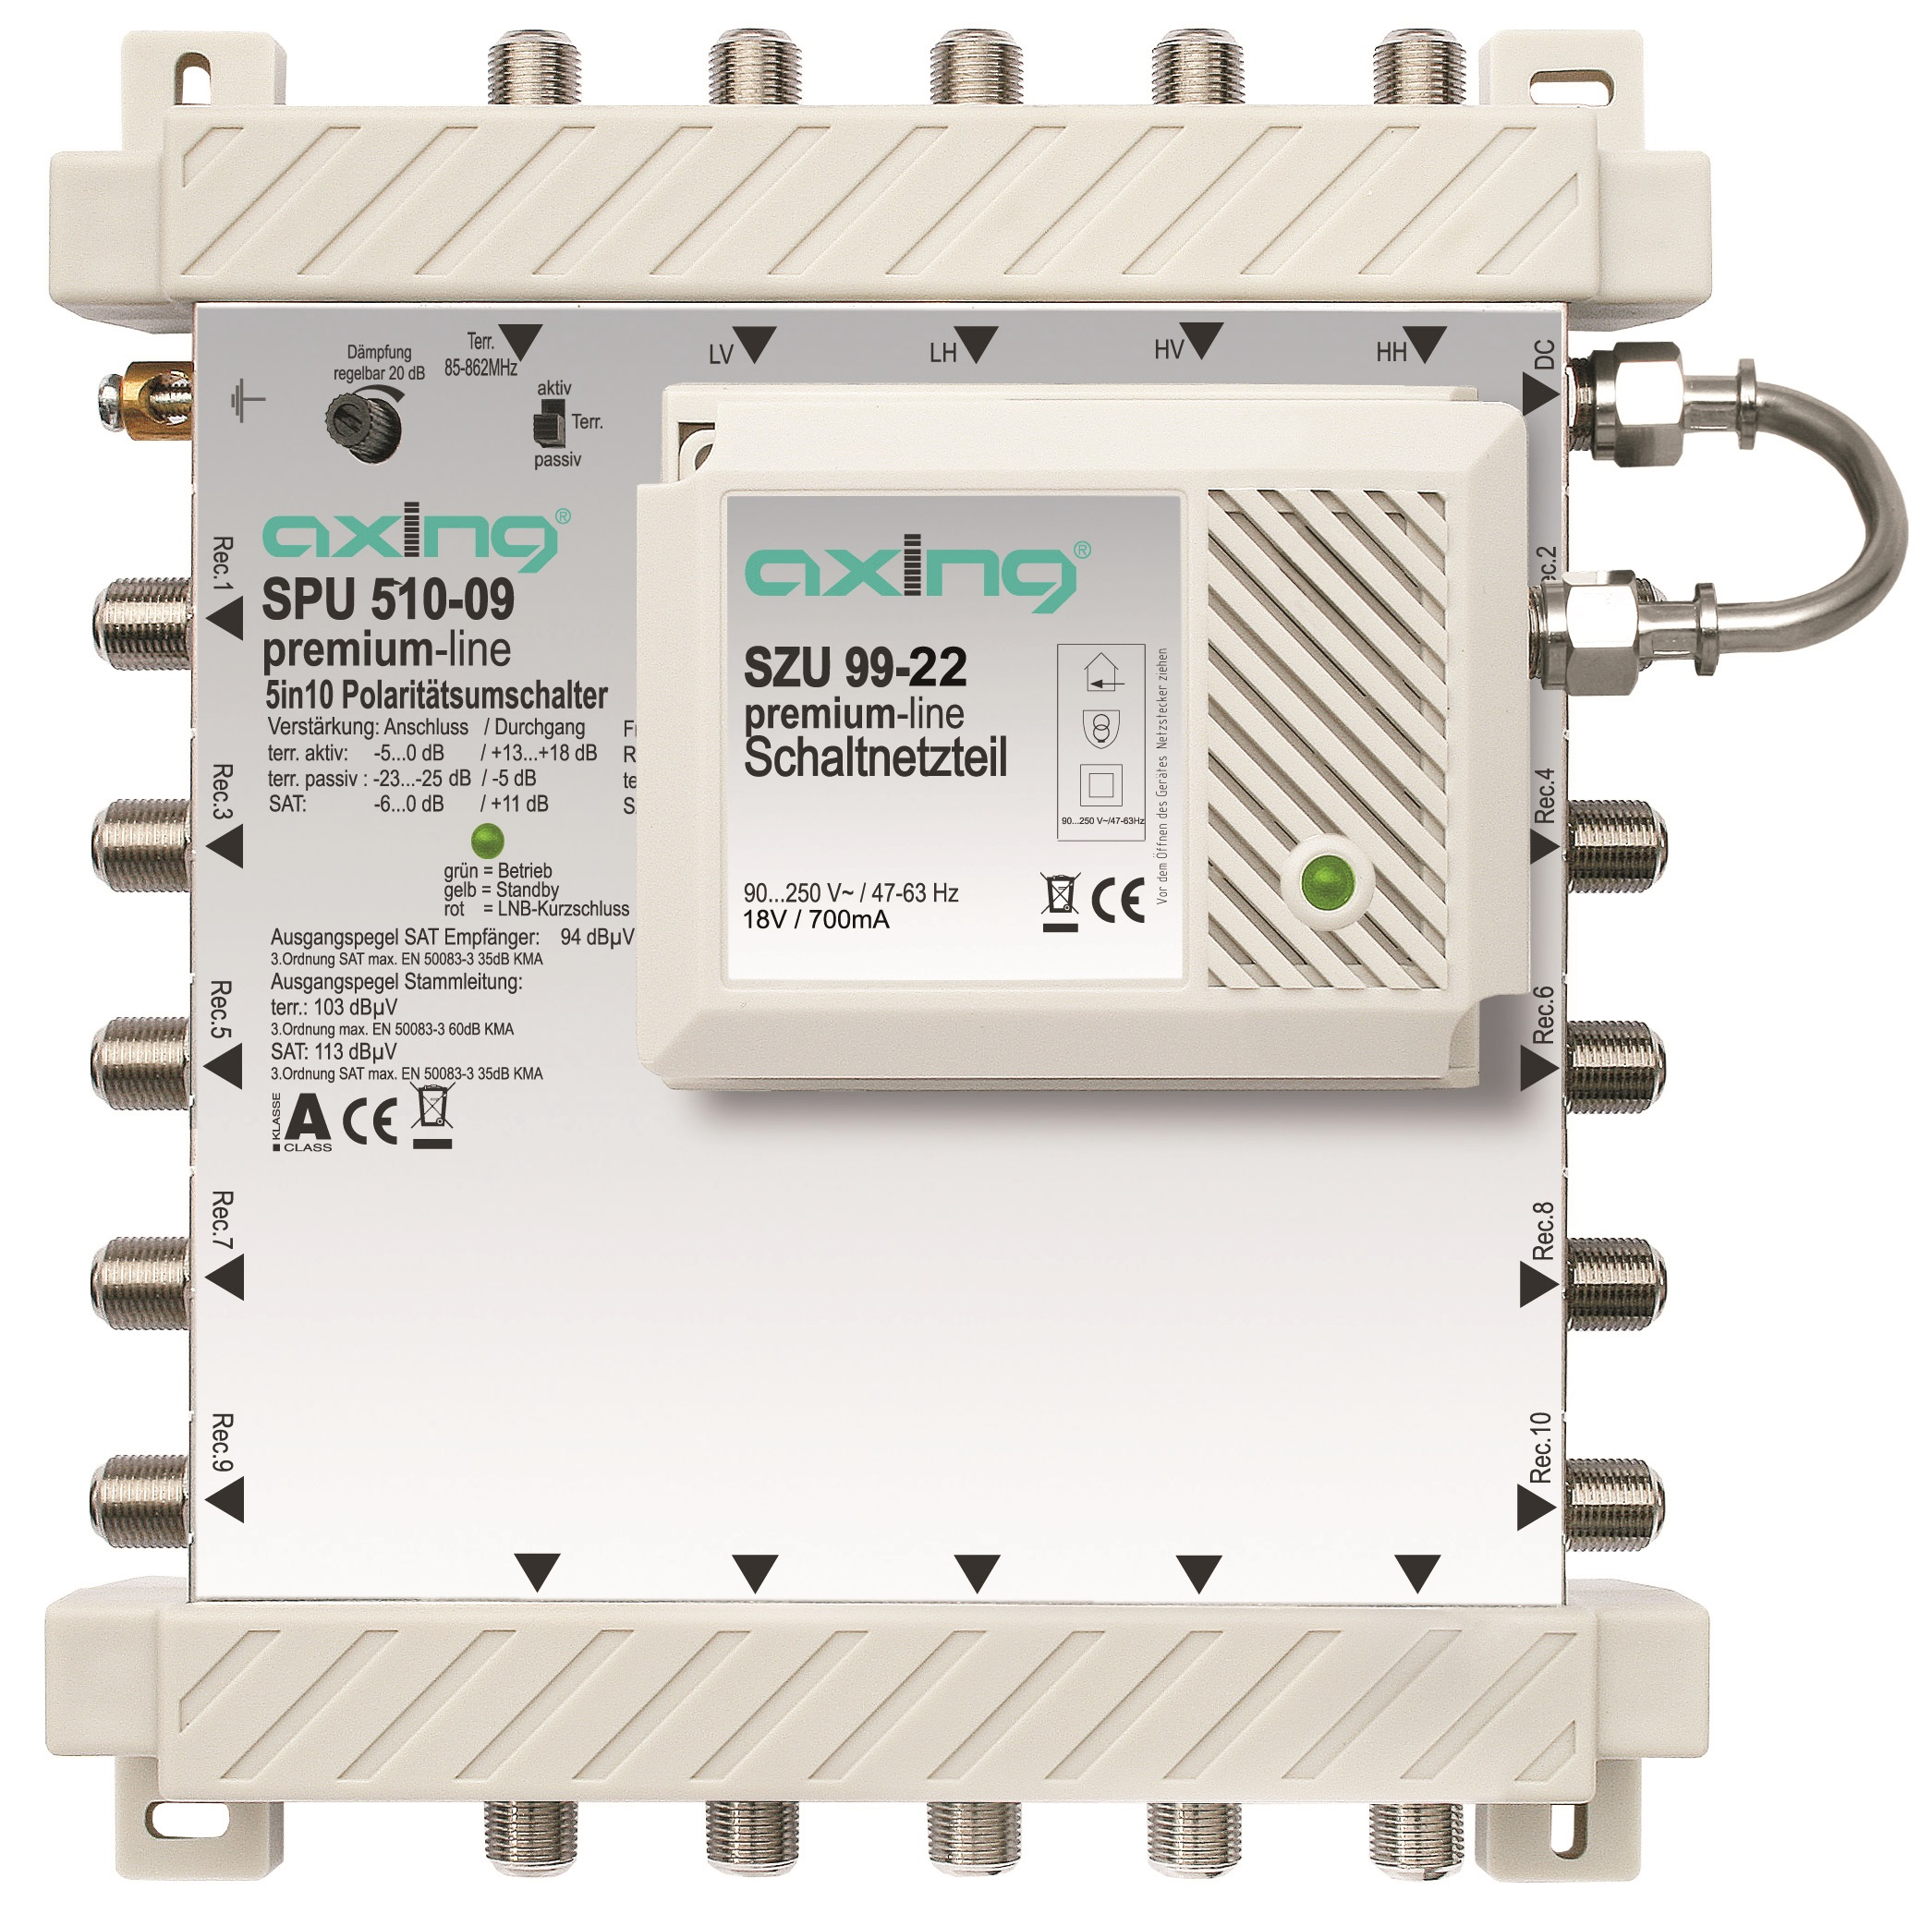 1 Stk SAT Multischalter  5 in 10, kaskadierbar, SPU 510-09 HSATS510KA